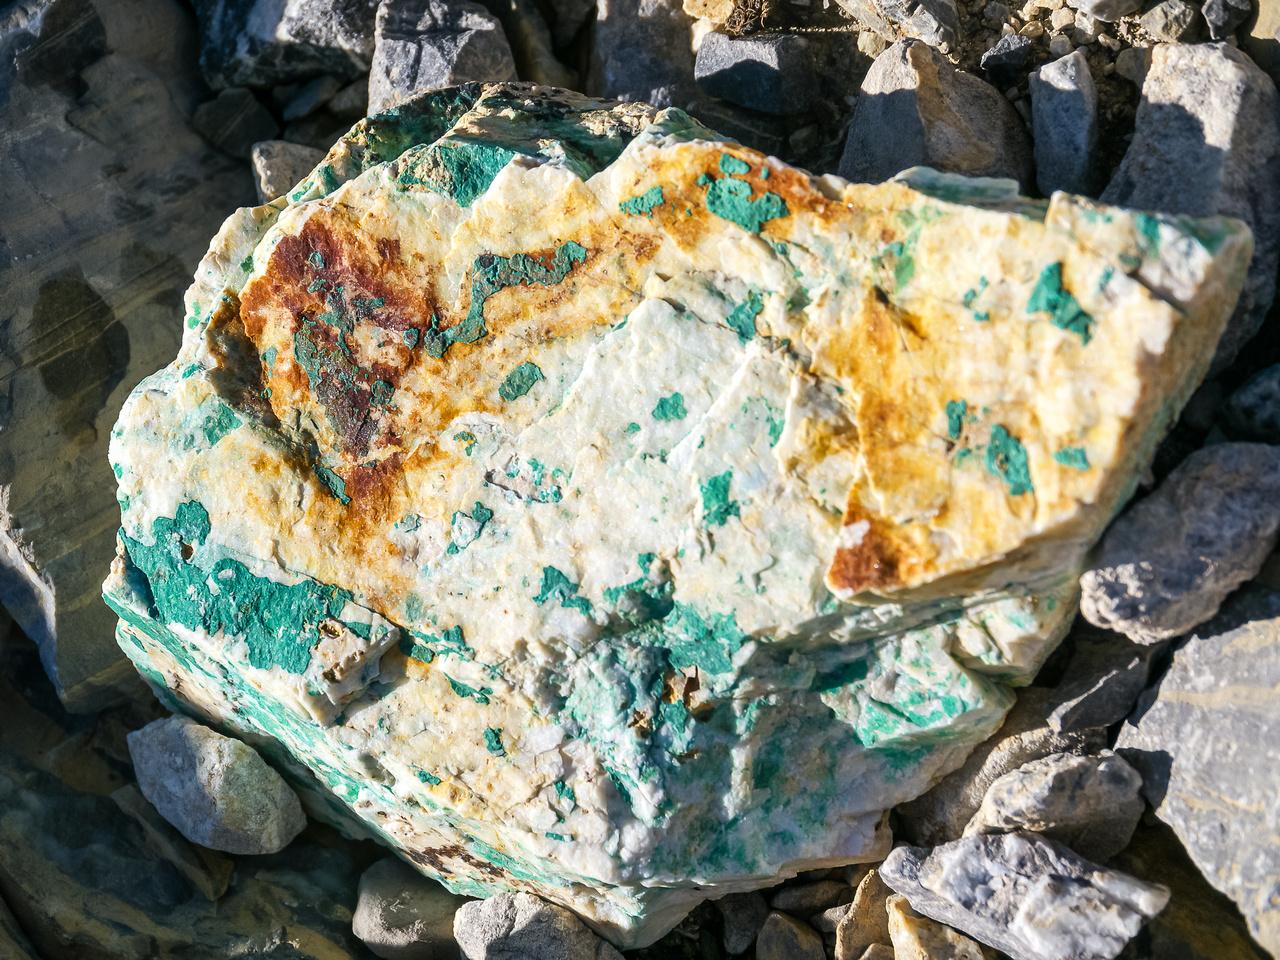 Interesting rock.